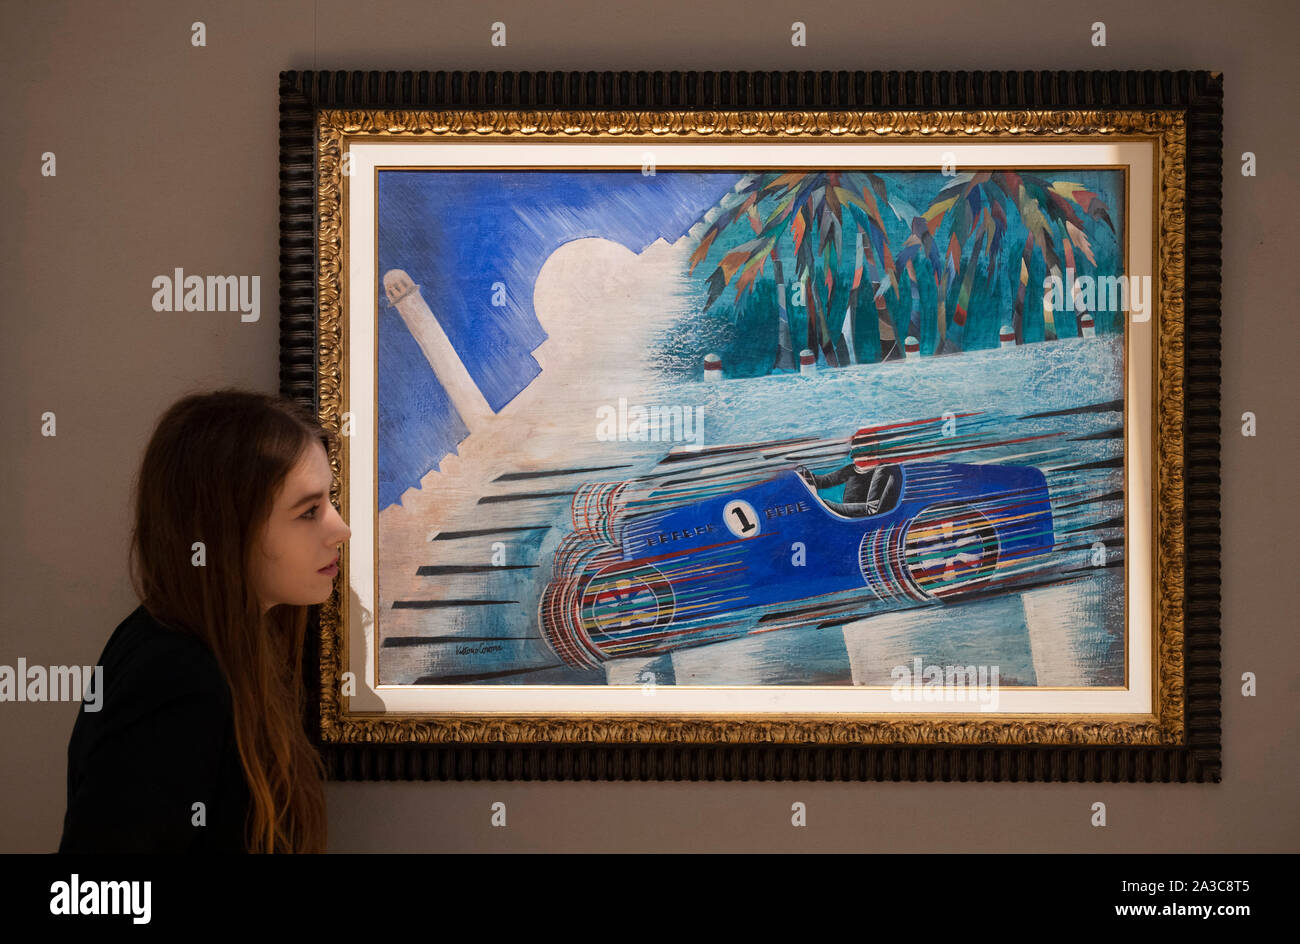 Bonhams, New Bond Street, London, UK. 7th October 2019. Highlights from Bonhams Impressionist and Modern Art sale on 10th October include Gran Premio di Tripoli by Vittorio Corona, estimate: £25,000-35,000. Credit: Malcolm Park/Alamy Live News. Stock Photo